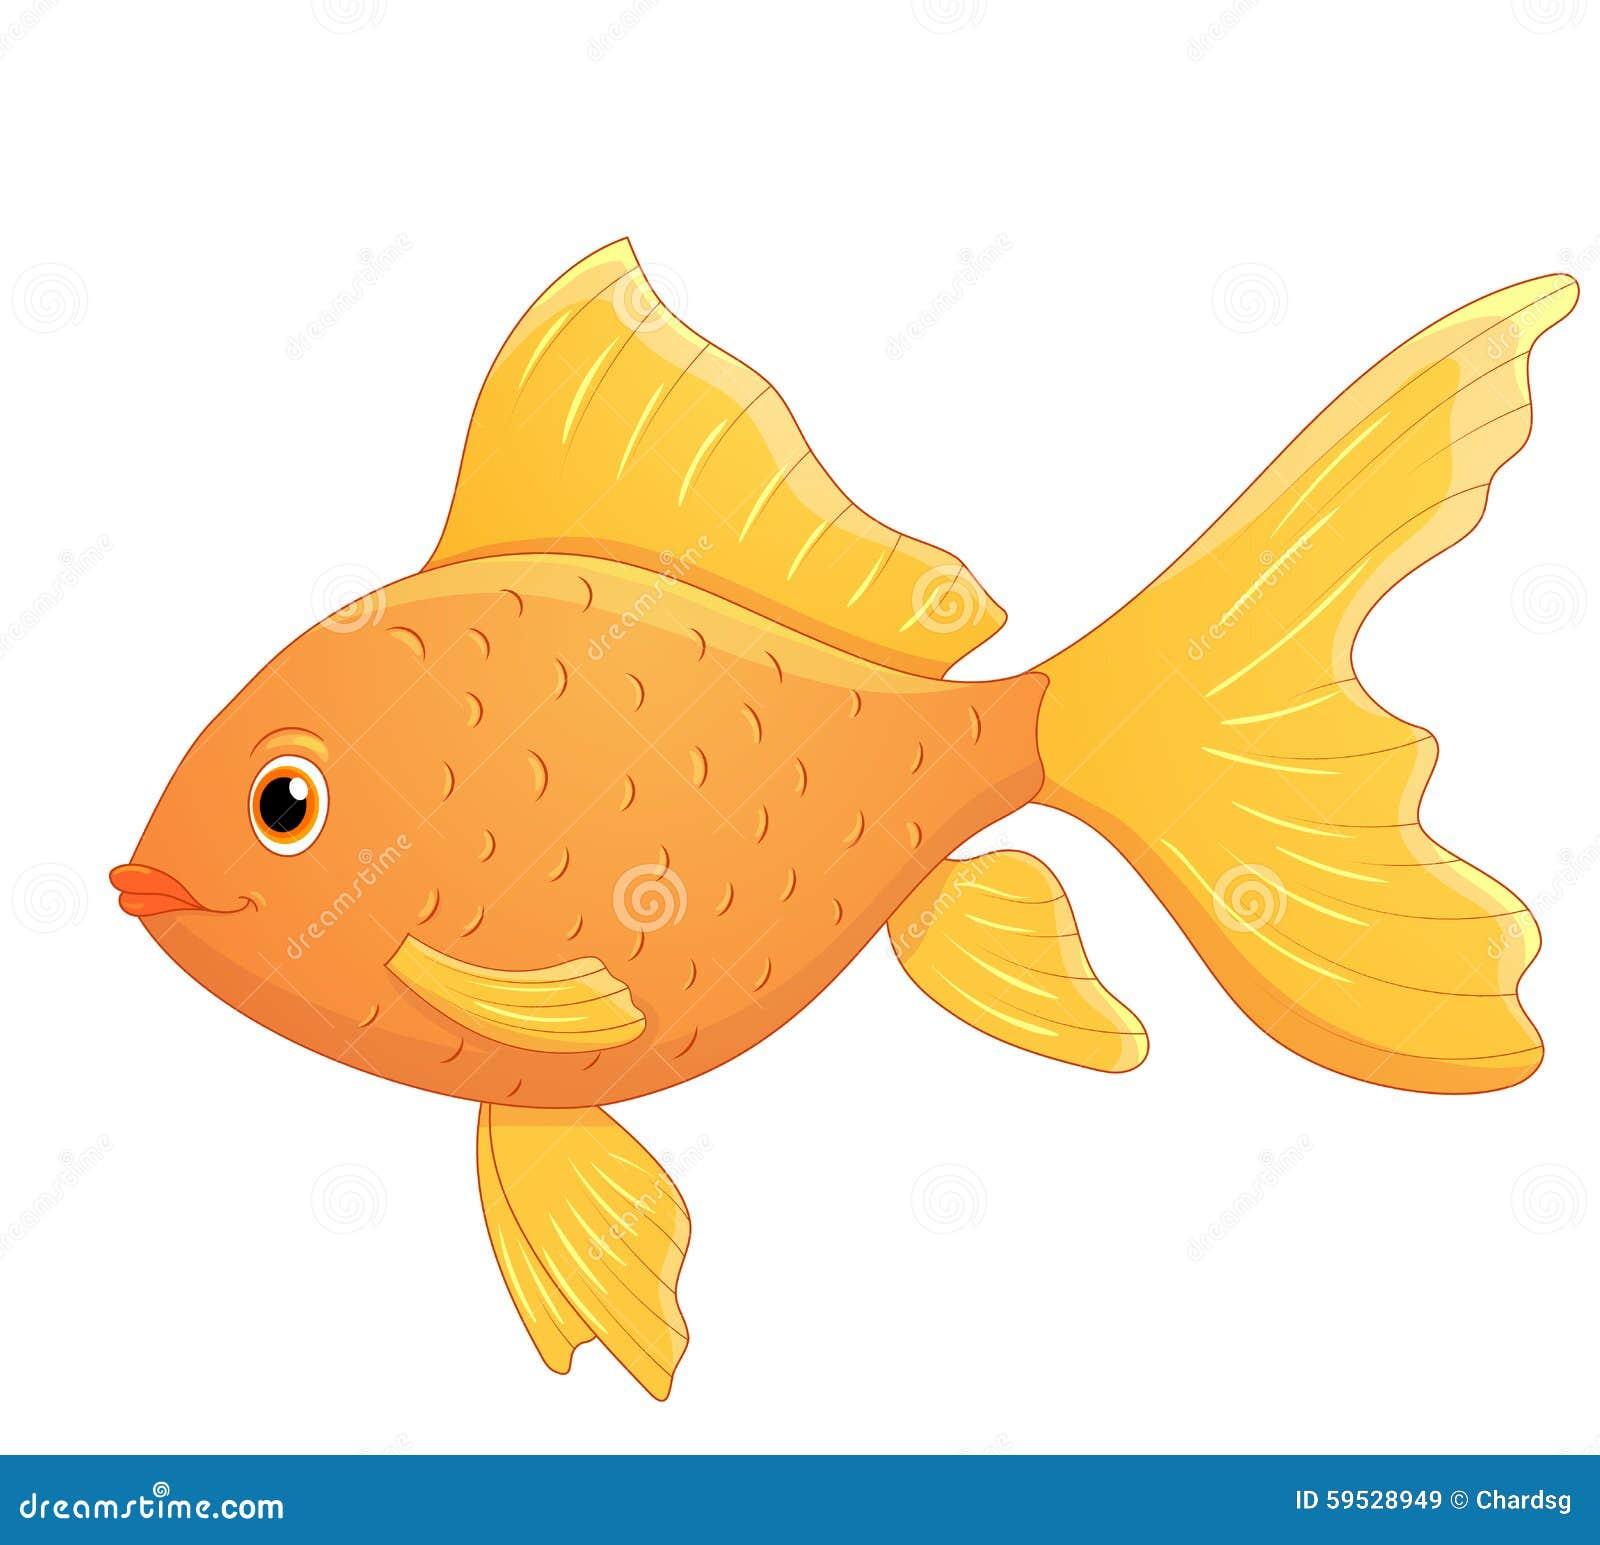 Cute Cartoon Goldfish Stock Vector. Illustration Of